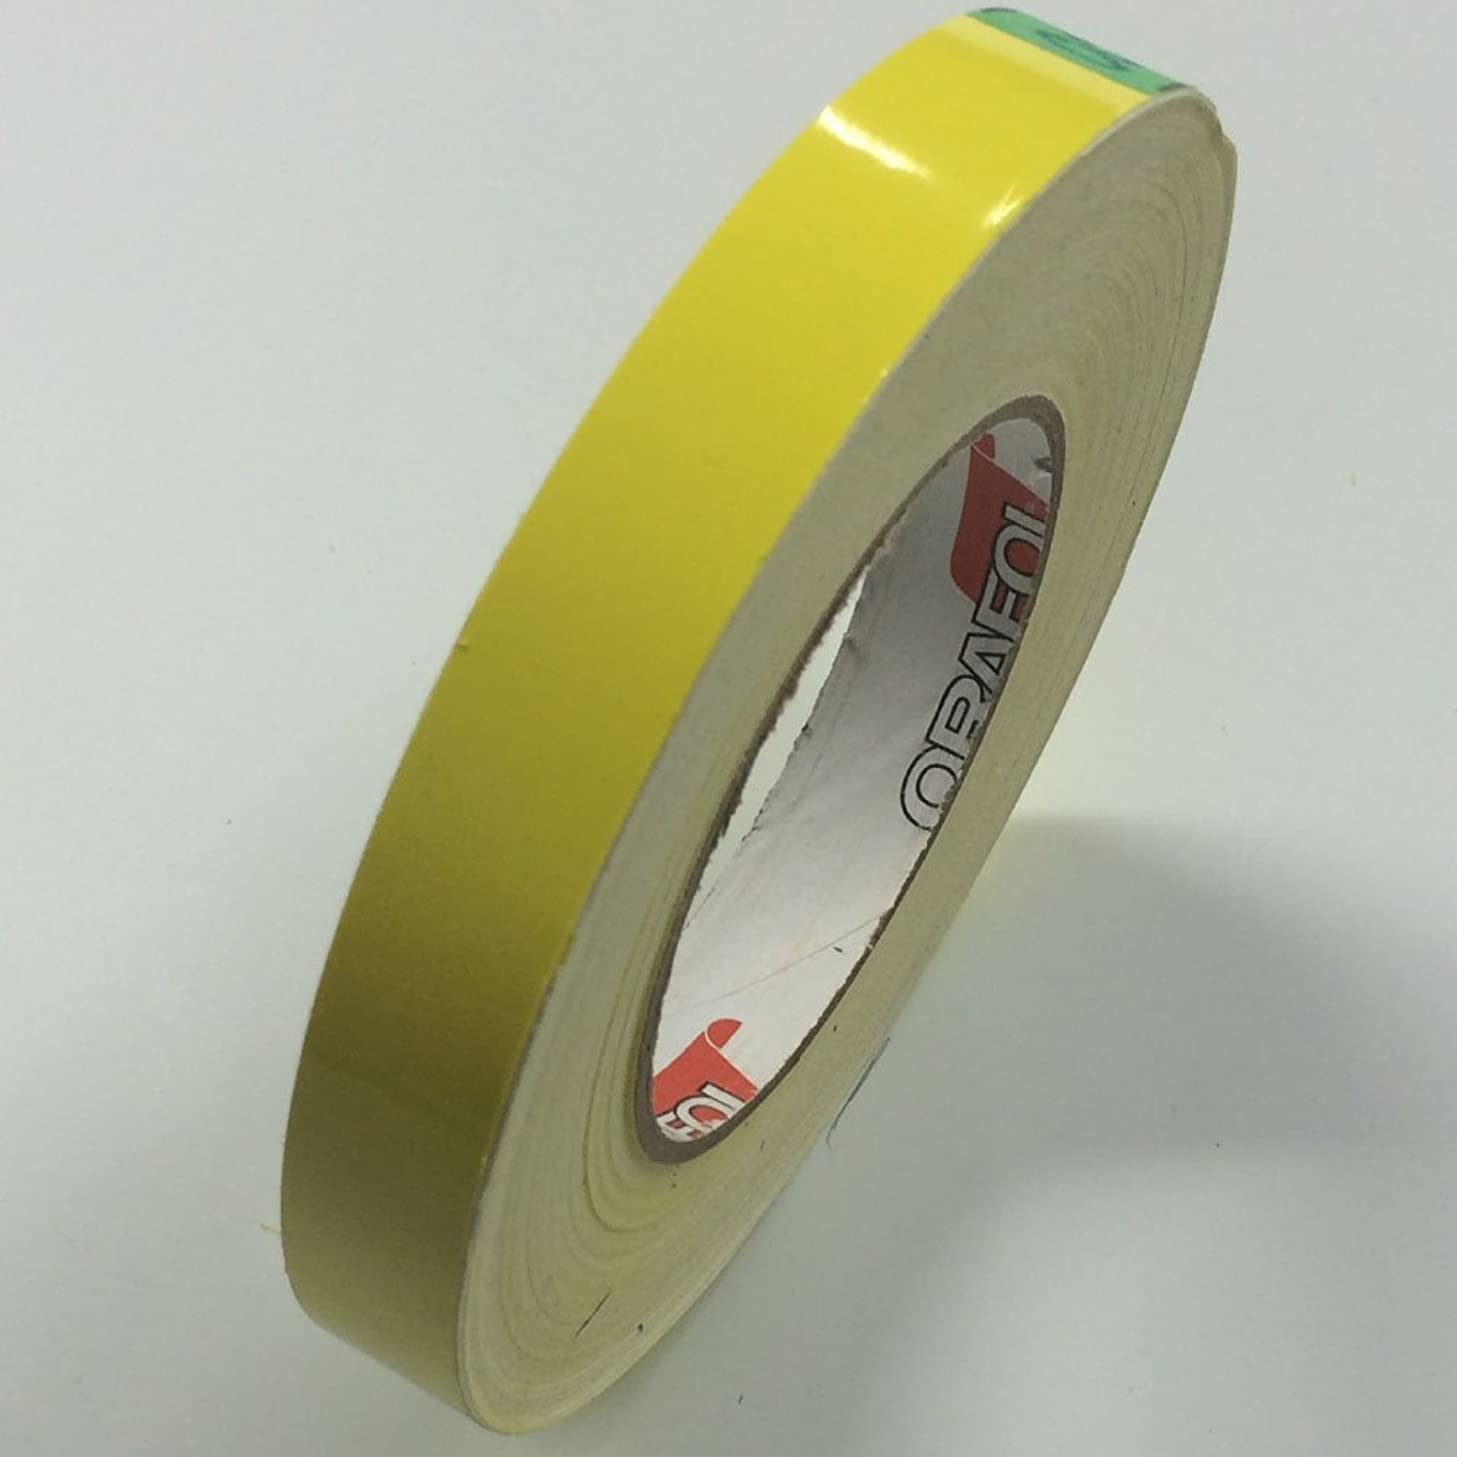 ORACAL 651 Vinyl Pinstriping Tape - Stripe Decals, Stickers, Striping - 1/2 Brimstone Yellow